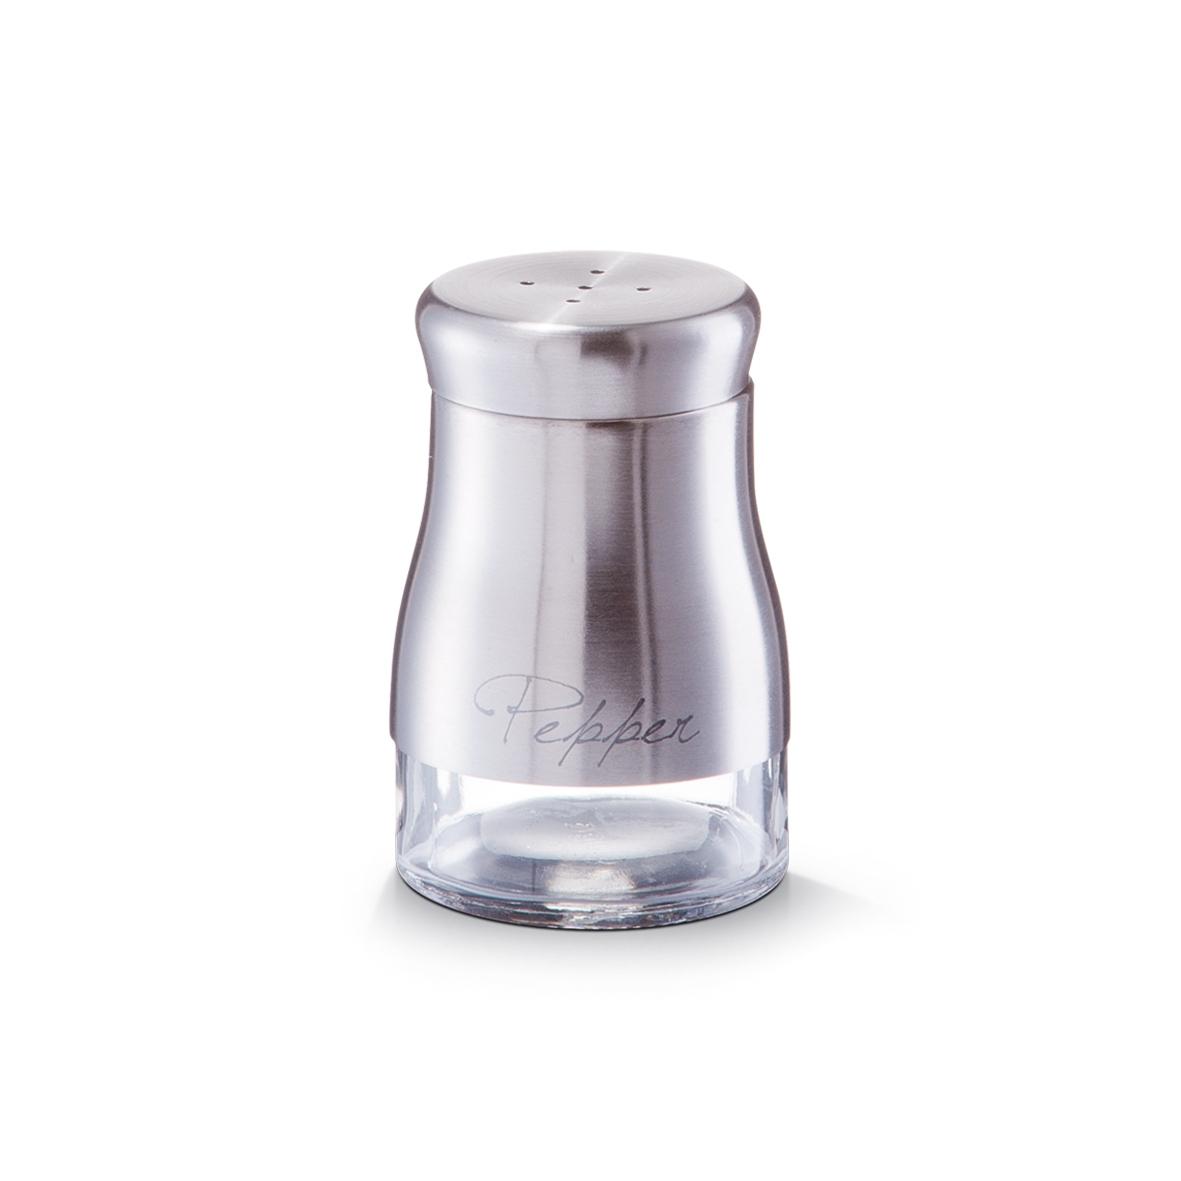 Pipernita din sticla si inox Pepper, Silver 150 ml, Ø 6xH9,5 cm imagine